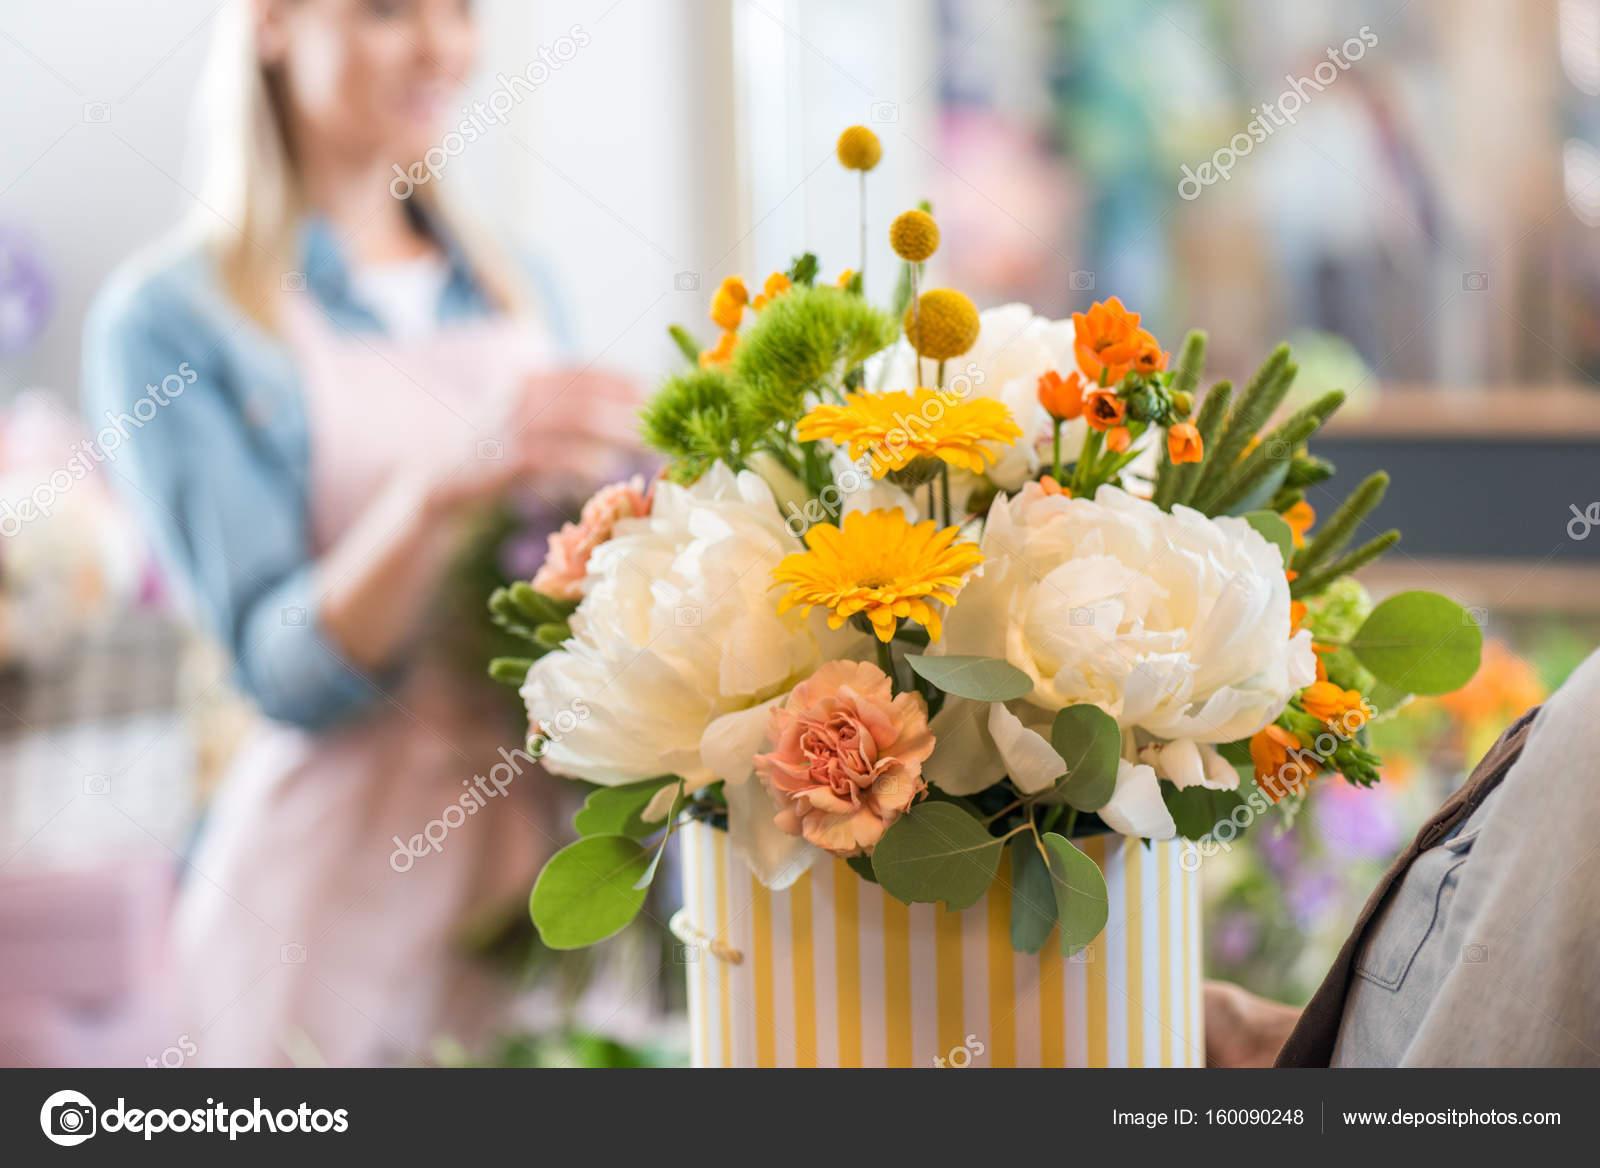 Beautiful flowers in flower shop stock photo arturverkhovetskiy beautiful flowers in flower shop stock photo izmirmasajfo